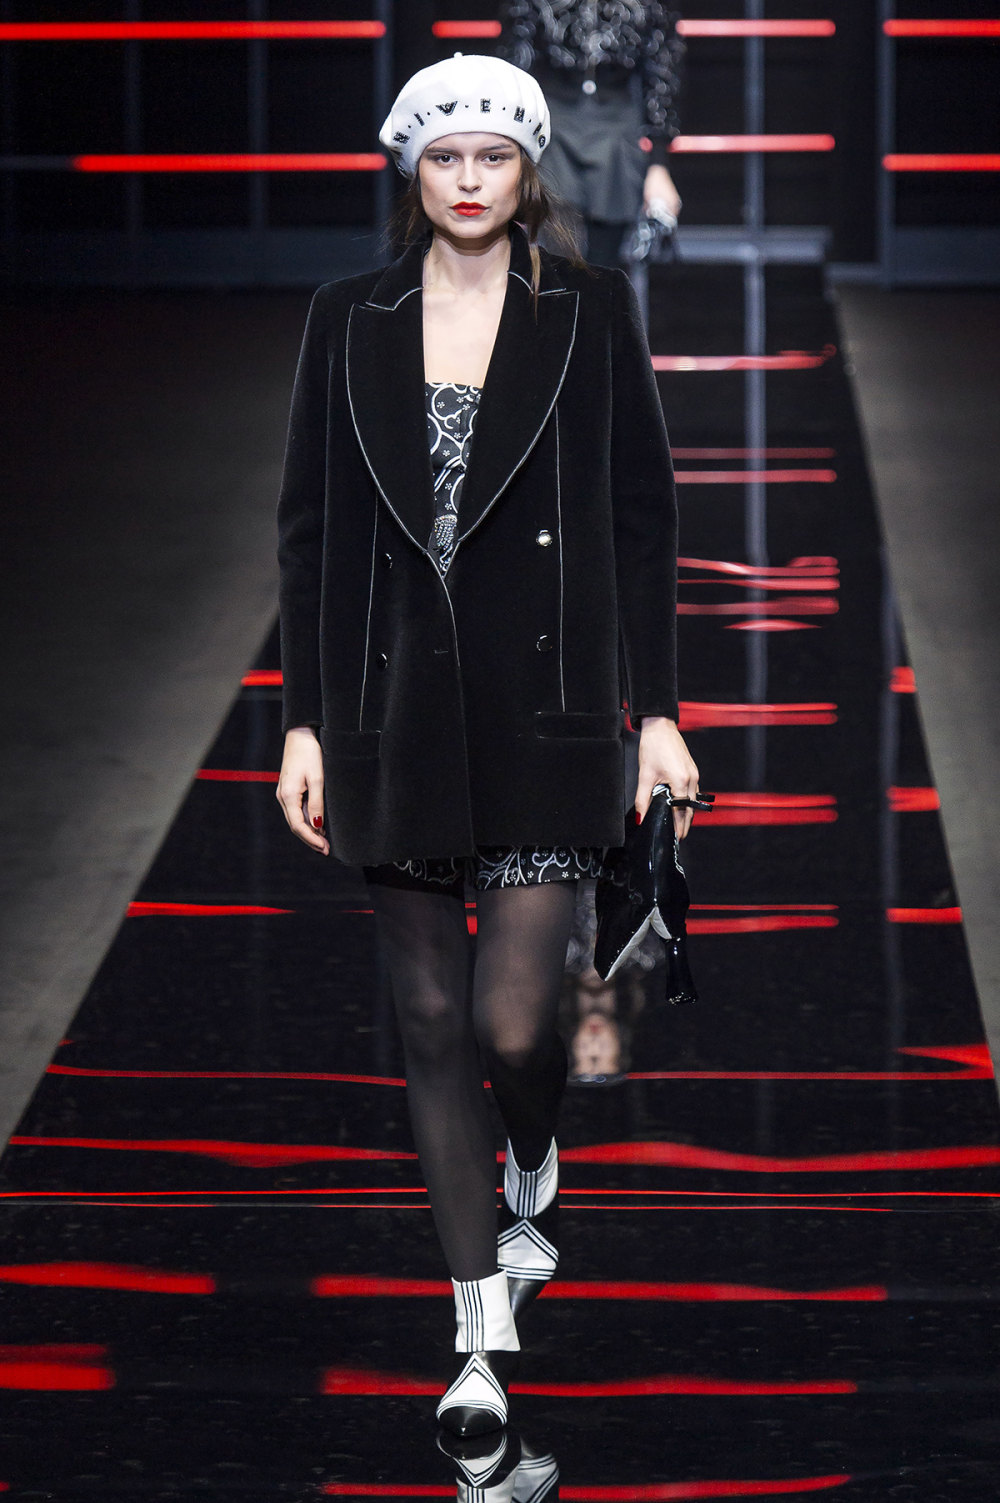 Emporio Armani时装系列畅的裤子带有柔滑裙子的鸡尾酒礼服-30.jpg